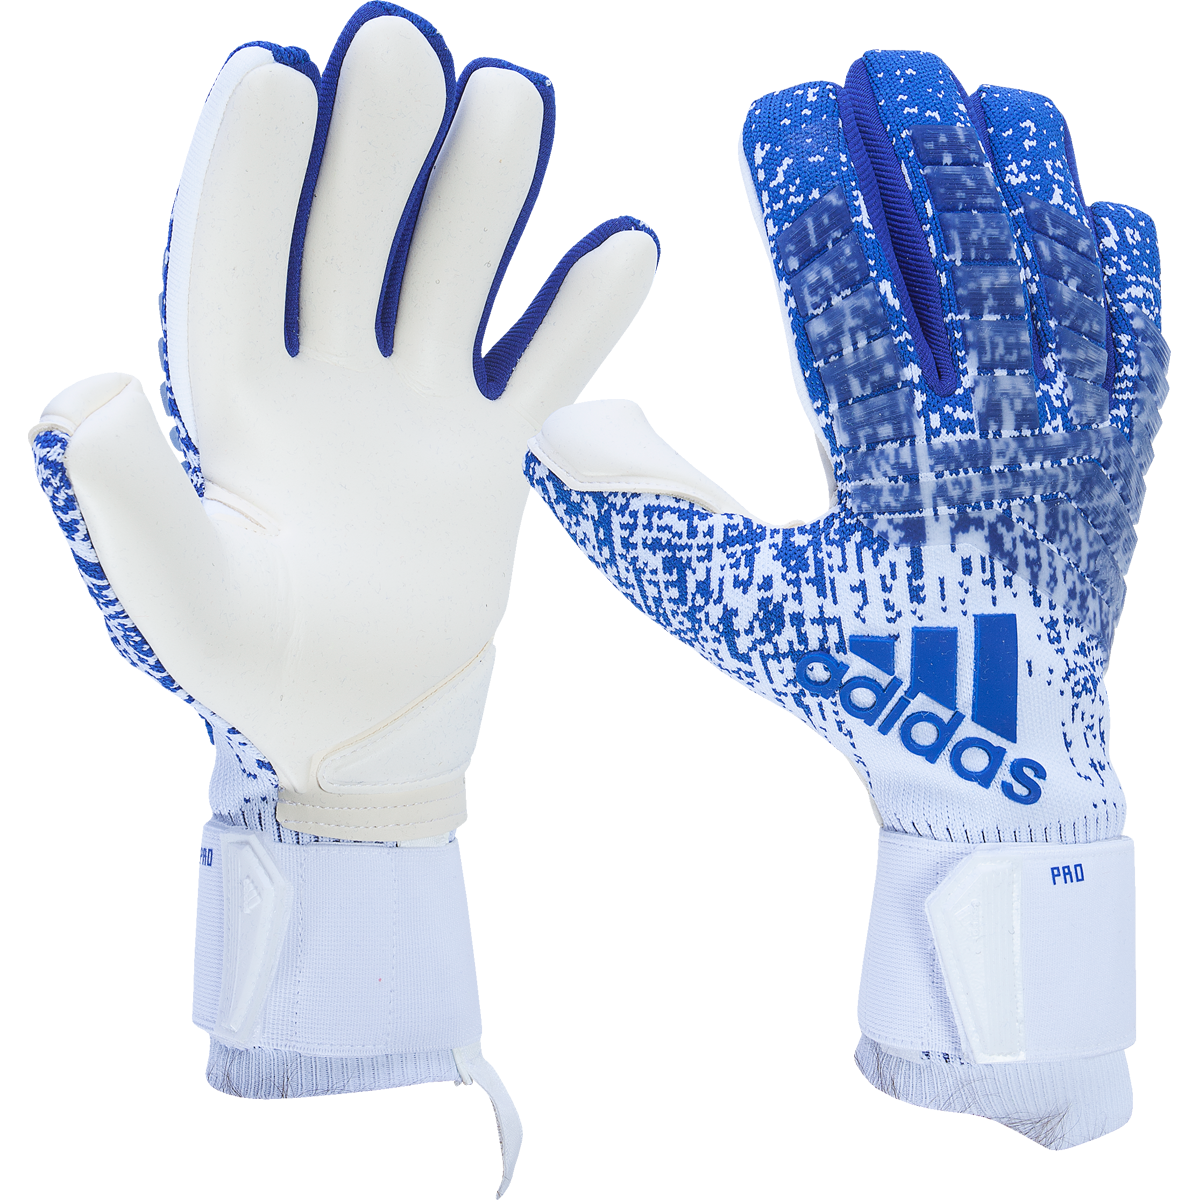 Adidas Predator Pro Goalkeeper Gloves 12 Goalkeeper Gloves Goalkeeper Gloves